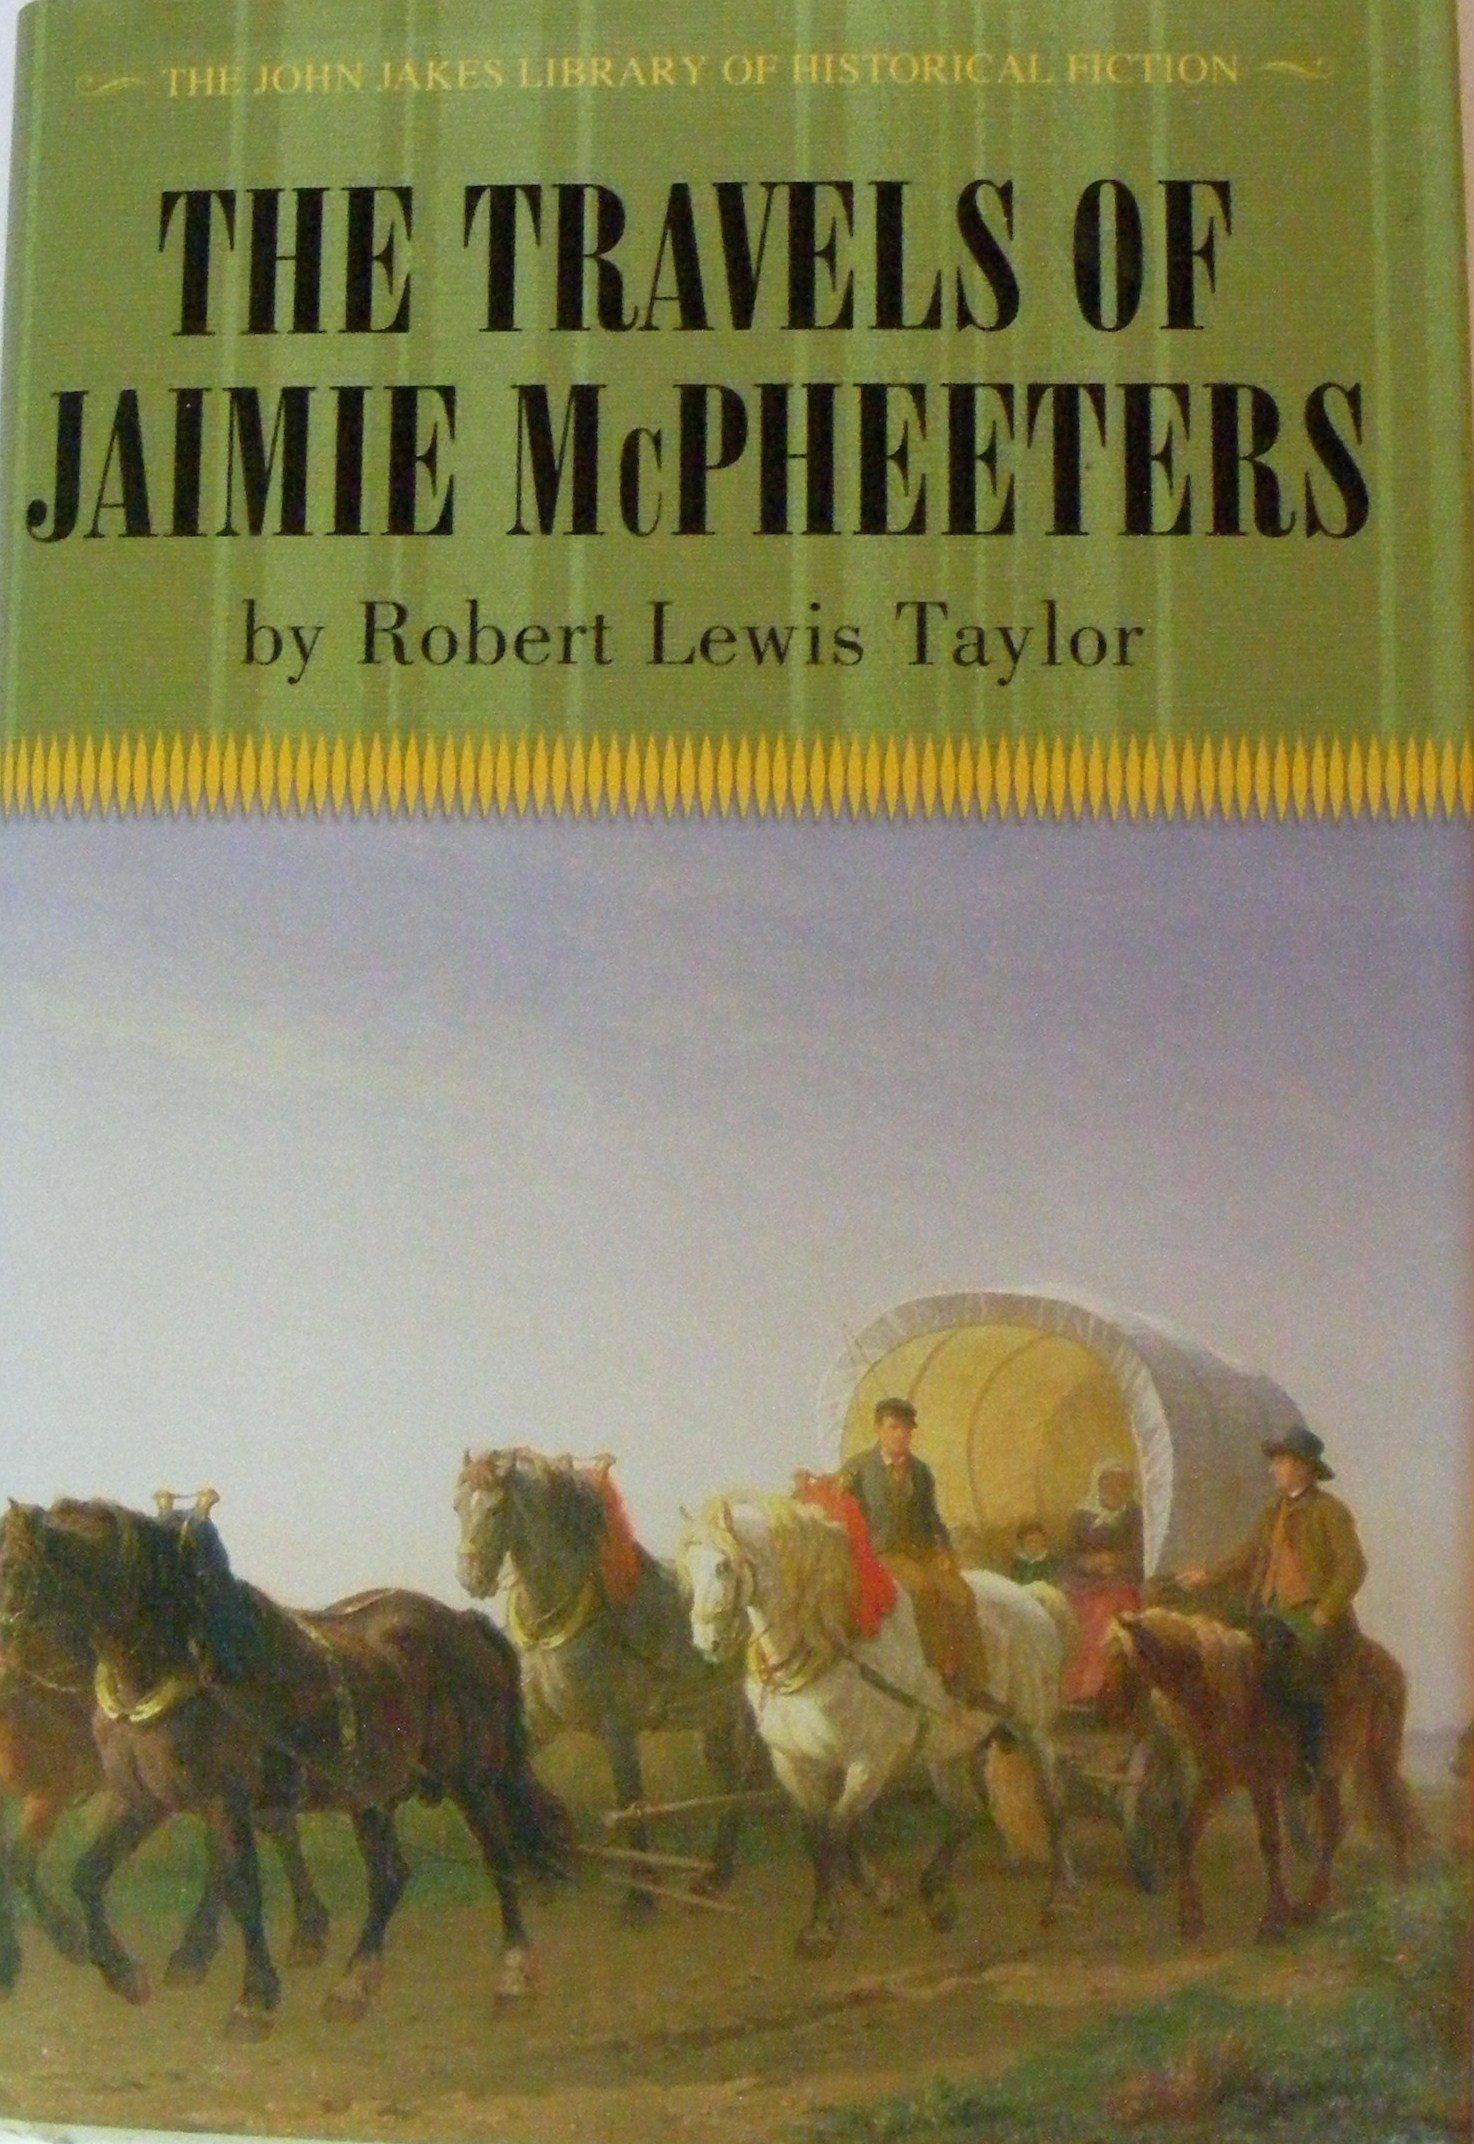 Download The Travels of Jaimie McPheeters ebook